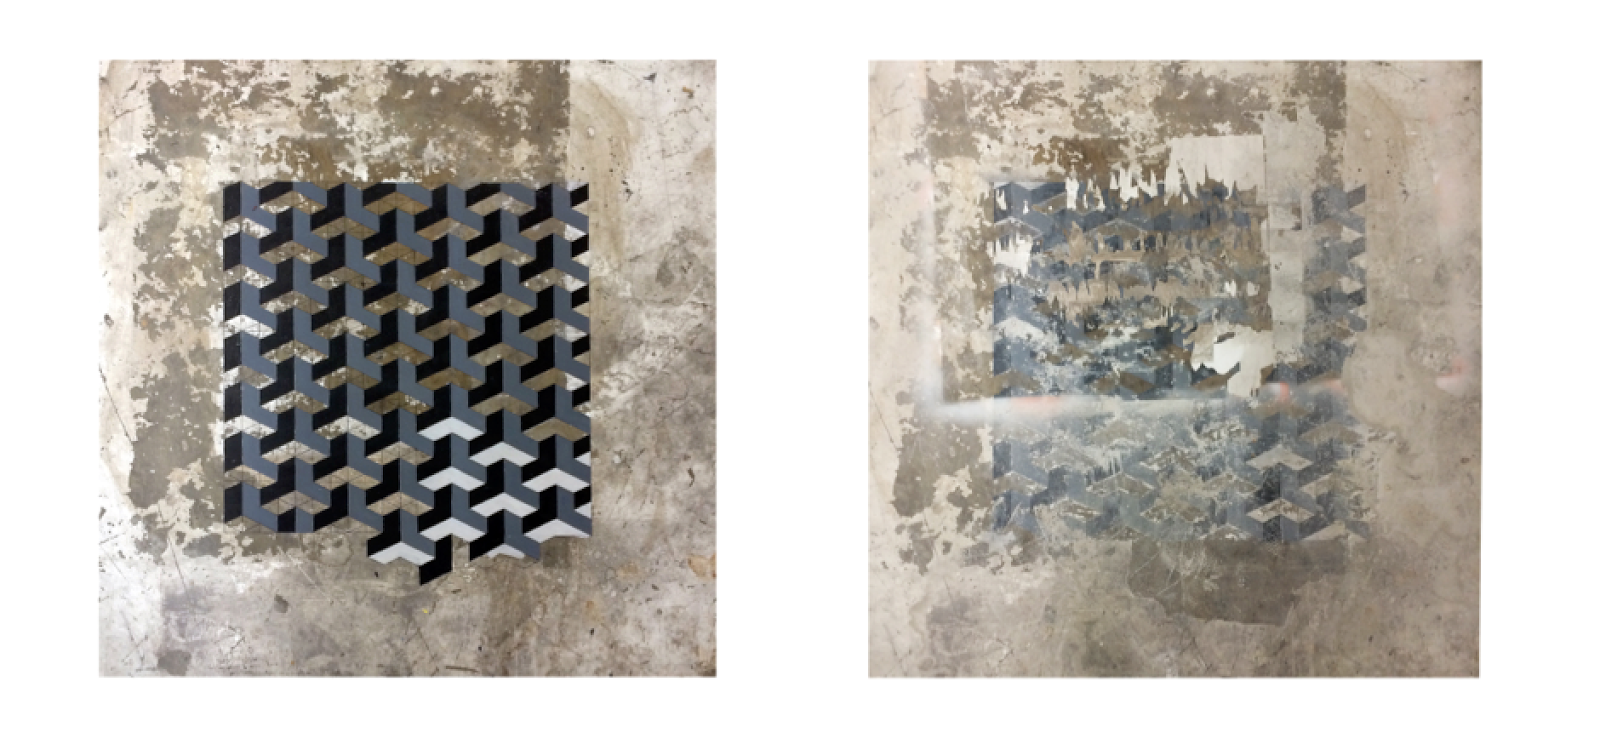 Bobst (Studio Floor) , 2014 Digital inkjet prints 16 x 16 inches each